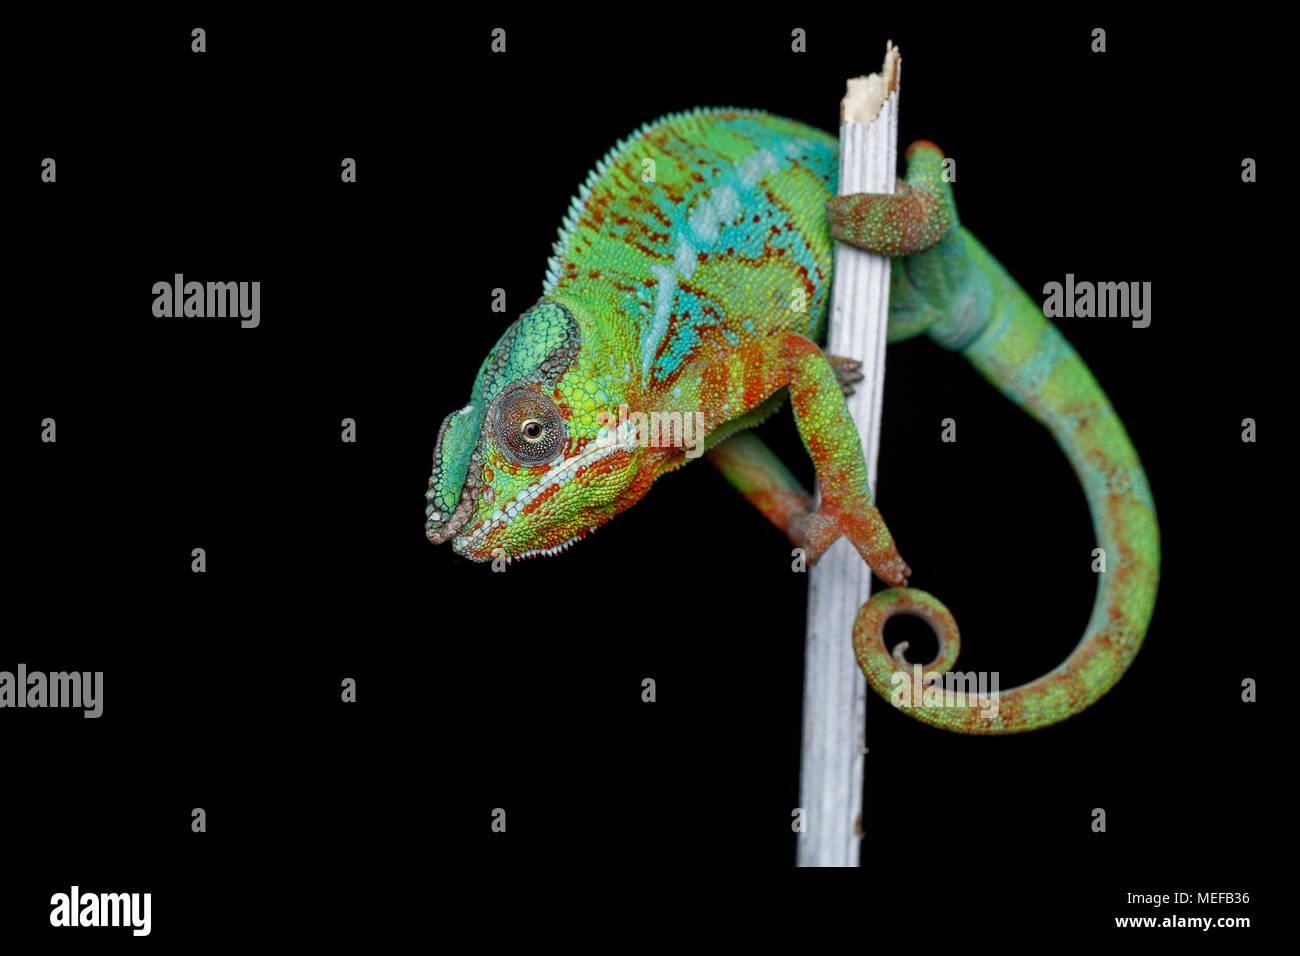 Lebendig chameleon Reptile sitzen auf Zweig. Studio erschossen. kopieren. Stockbild